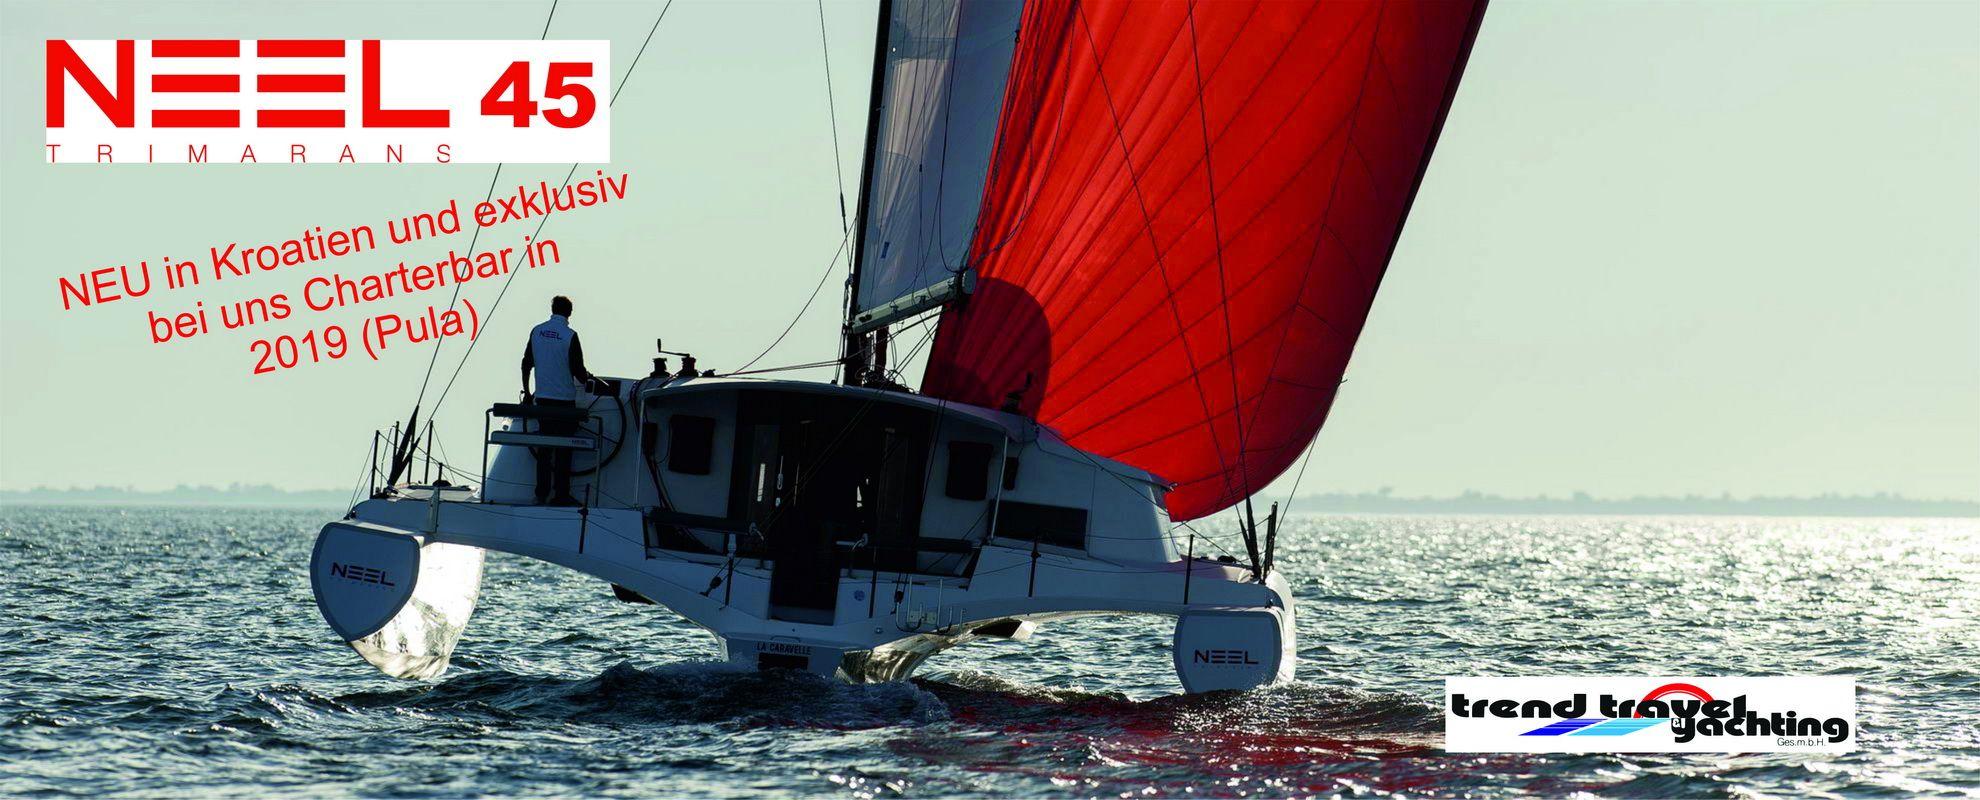 Trend Travel Yachting, NEEL 45 Trimaran, zu chartern ab Pula